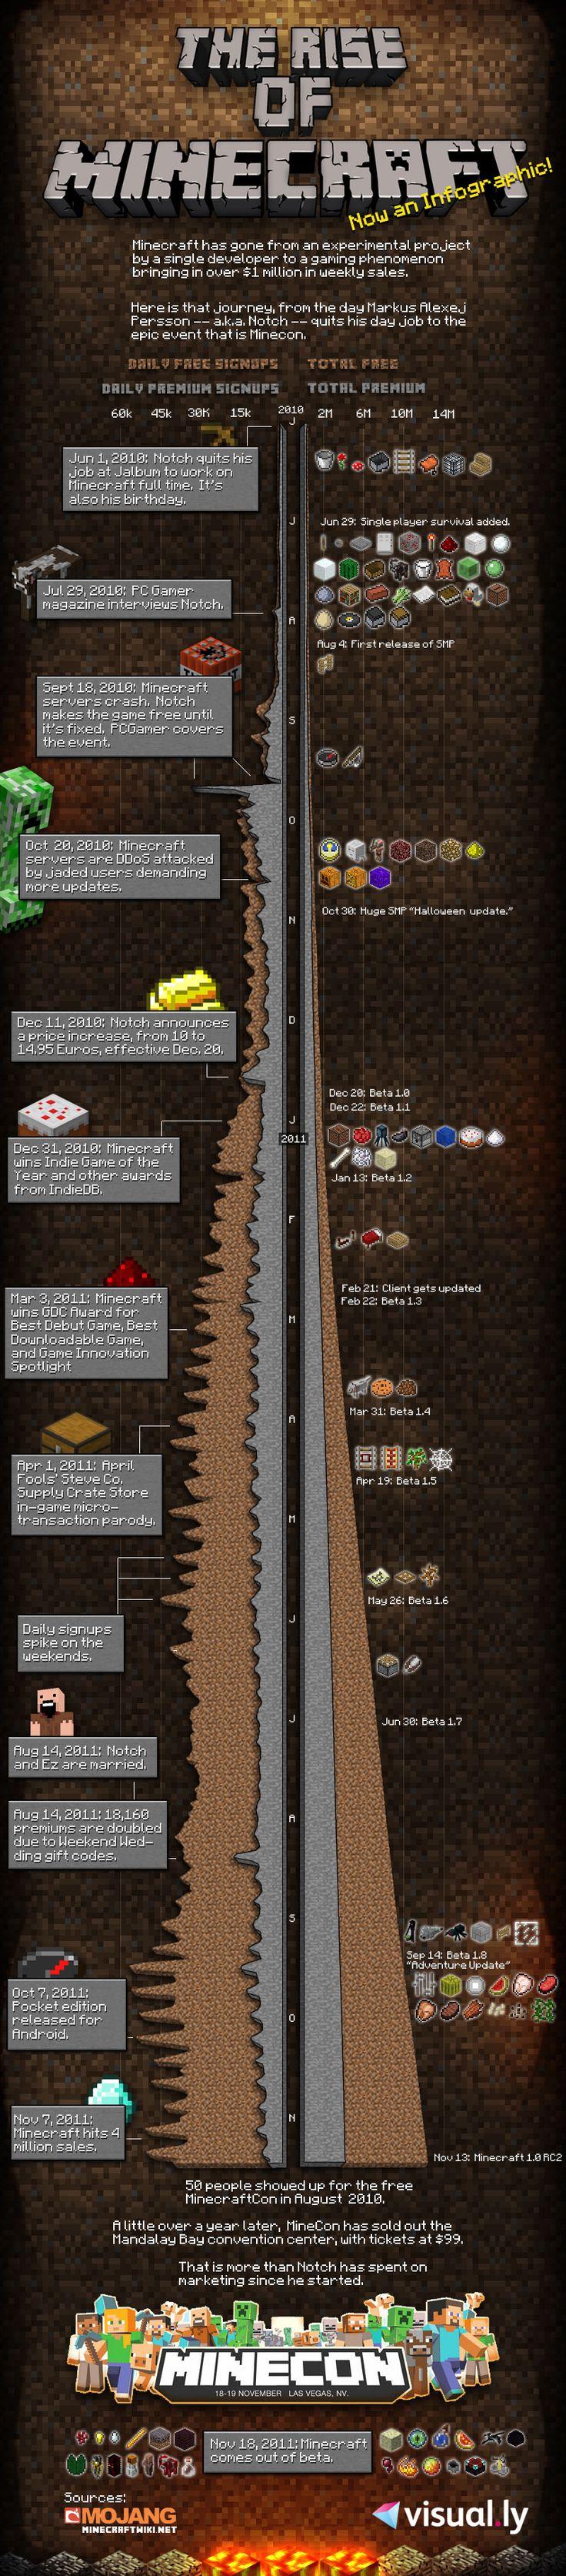 El inmenso mundo de Minecraft / The rise of Minecraft